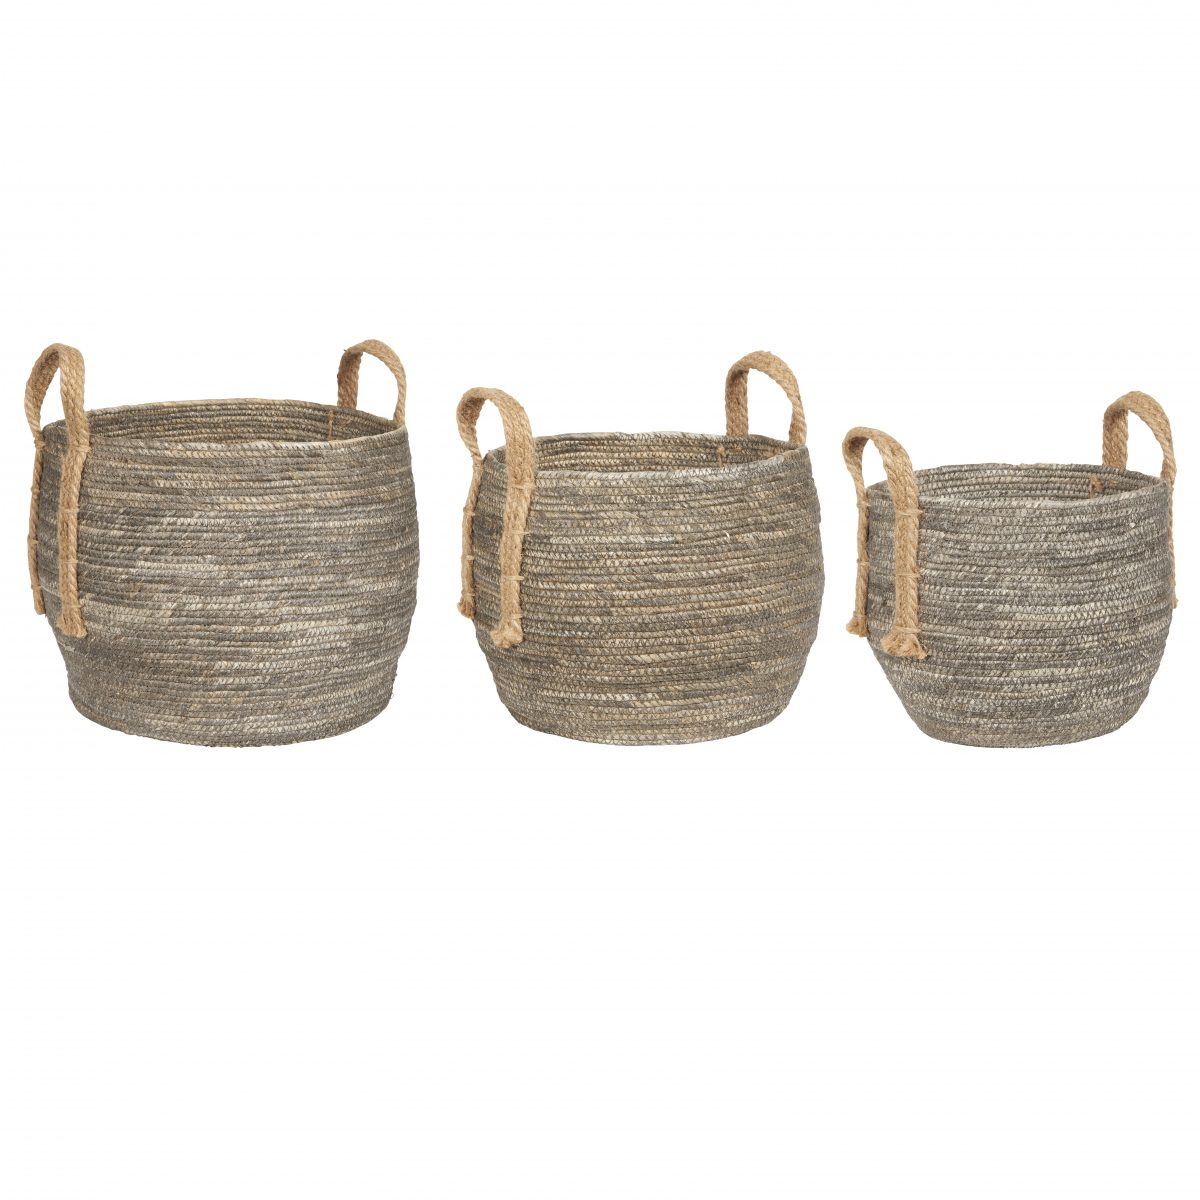 Em_home Ib_laursen Basket Set Jute Grey Home Decor